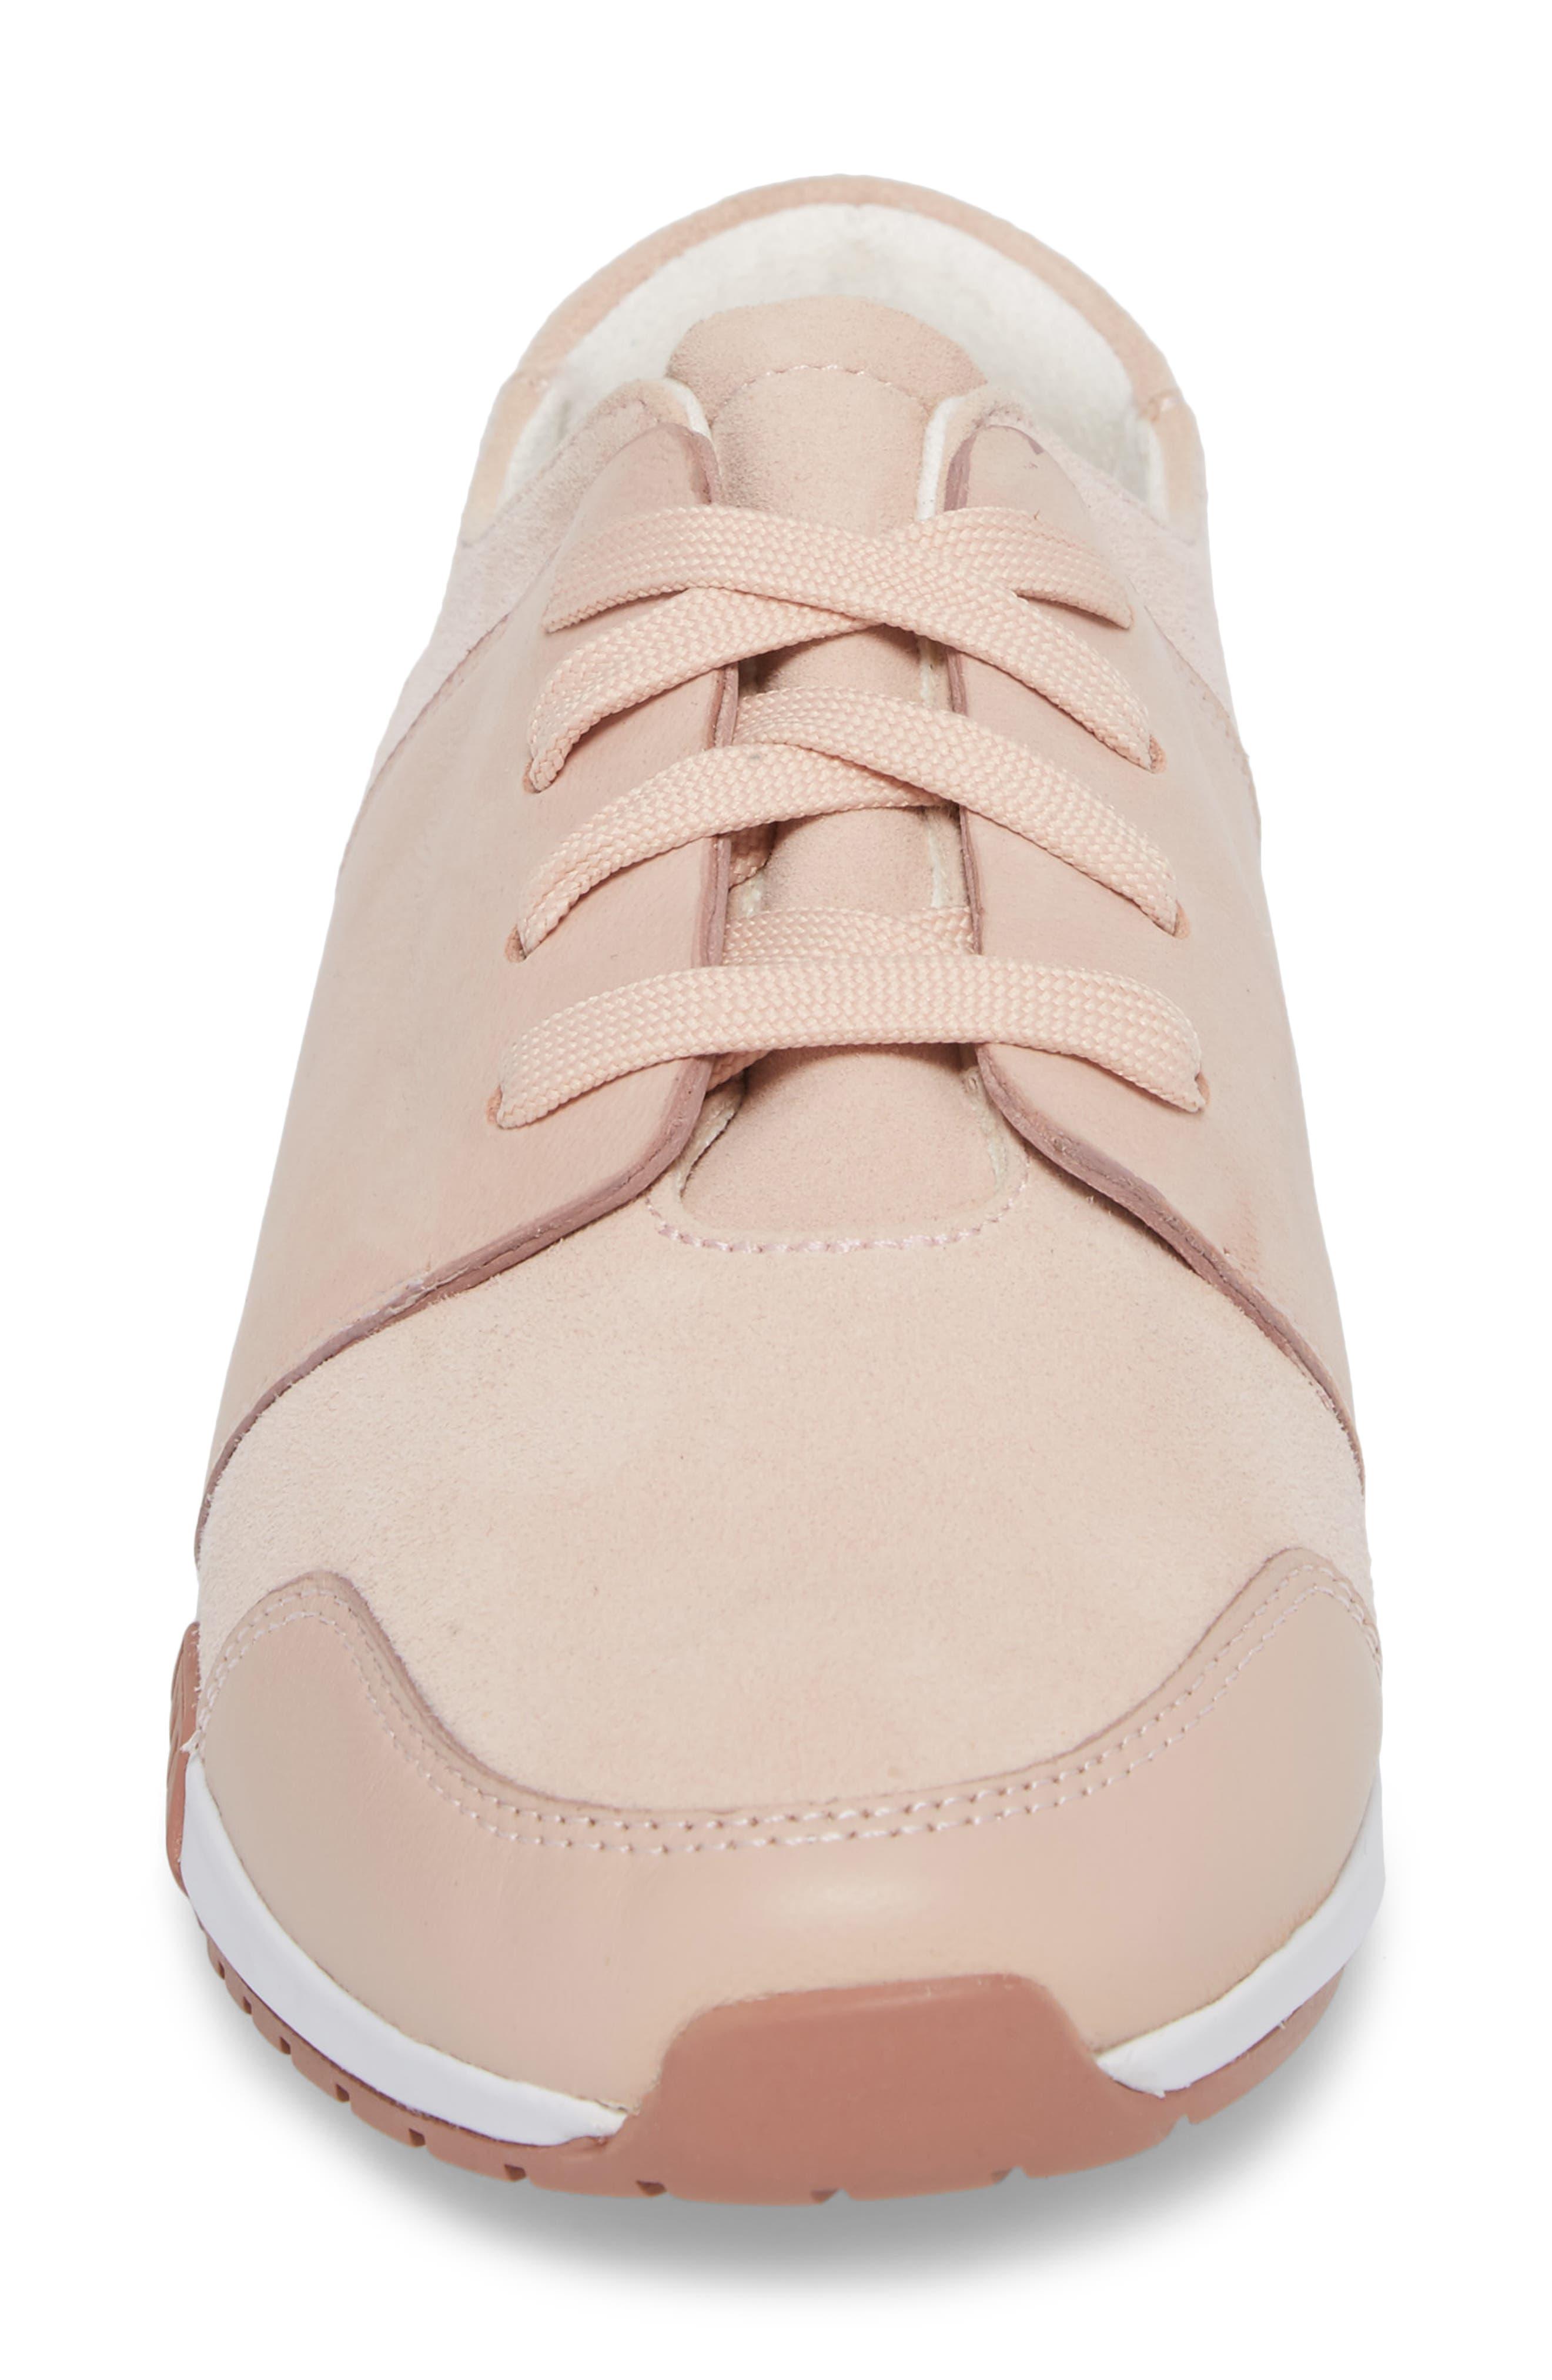 Sumner 2 Sneaker,                             Alternate thumbnail 4, color,                             Rose Suede